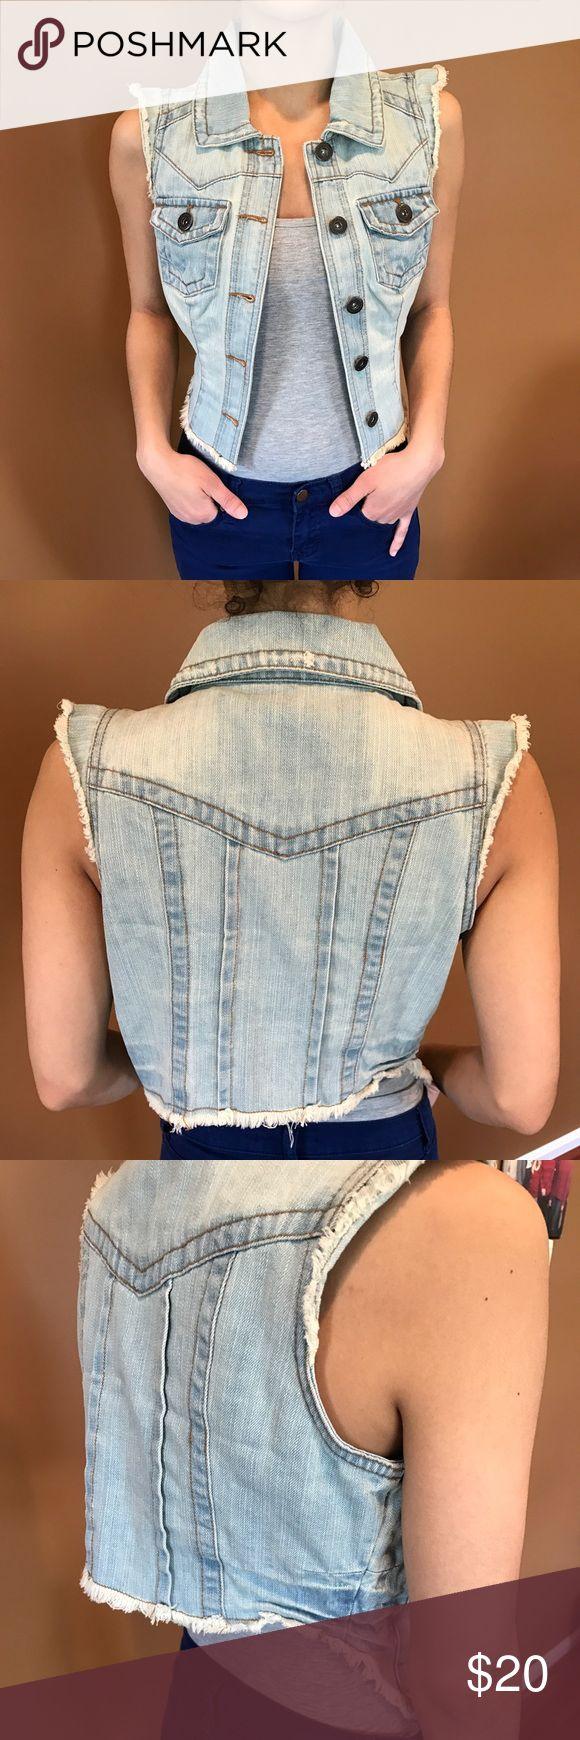 Jean jacket Light wash sleeveless Jean jacket Highway Jeans Jackets & Coats Jean Jackets